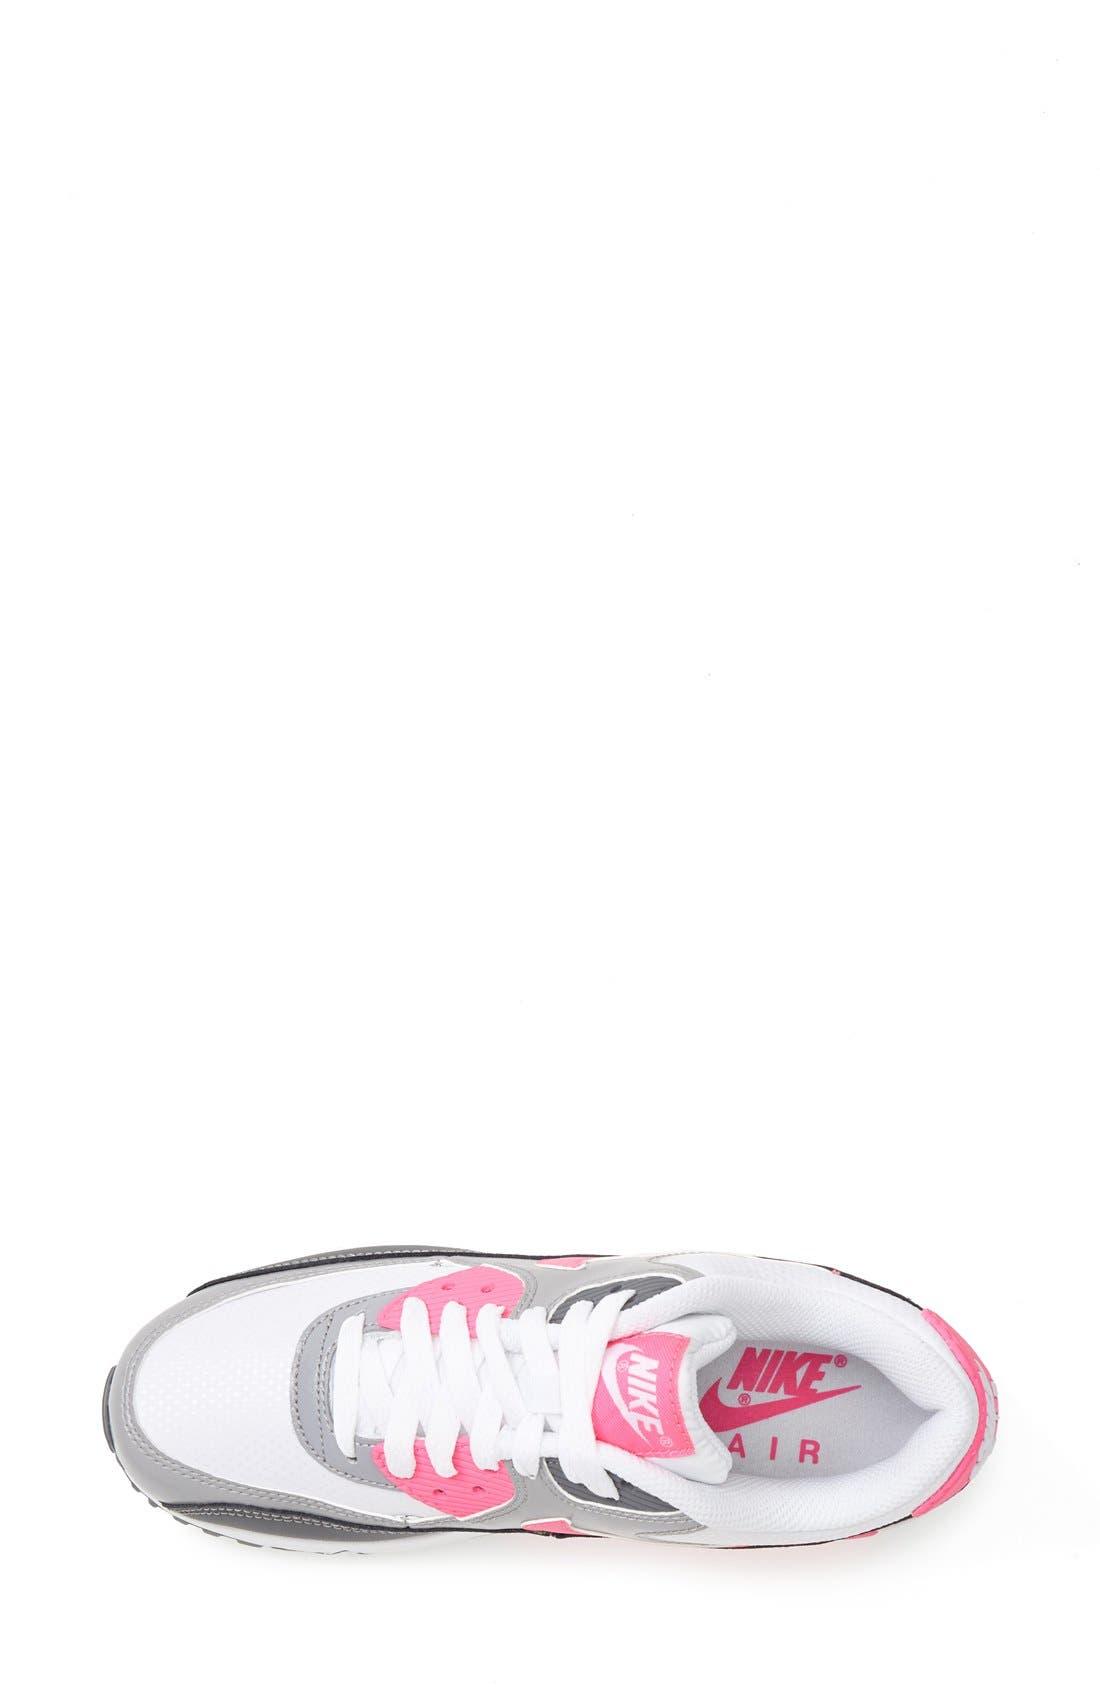 Alternate Image 3  - Nike 'Air Max - Essential' Sneaker (Women)